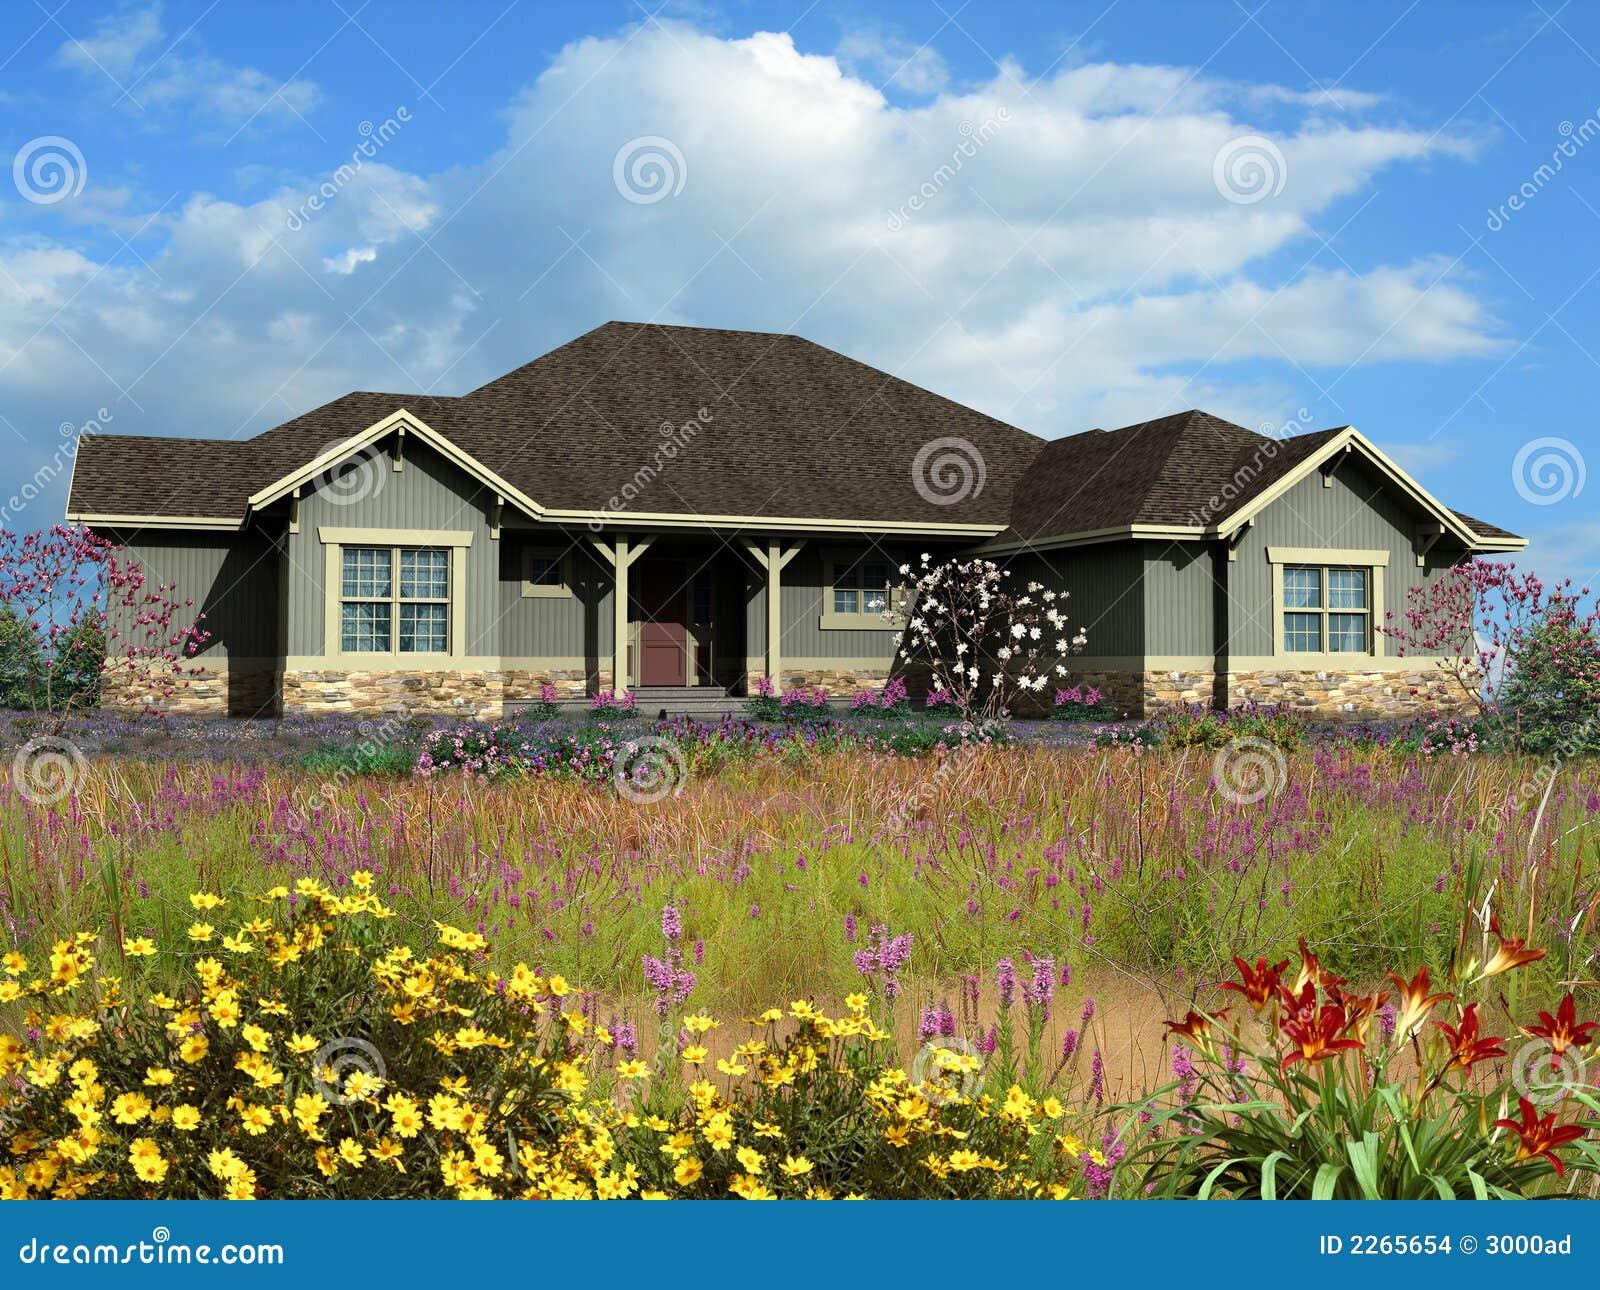 Modelo 3d de la casa de rancho foto de archivo imagen for Casa de modelos